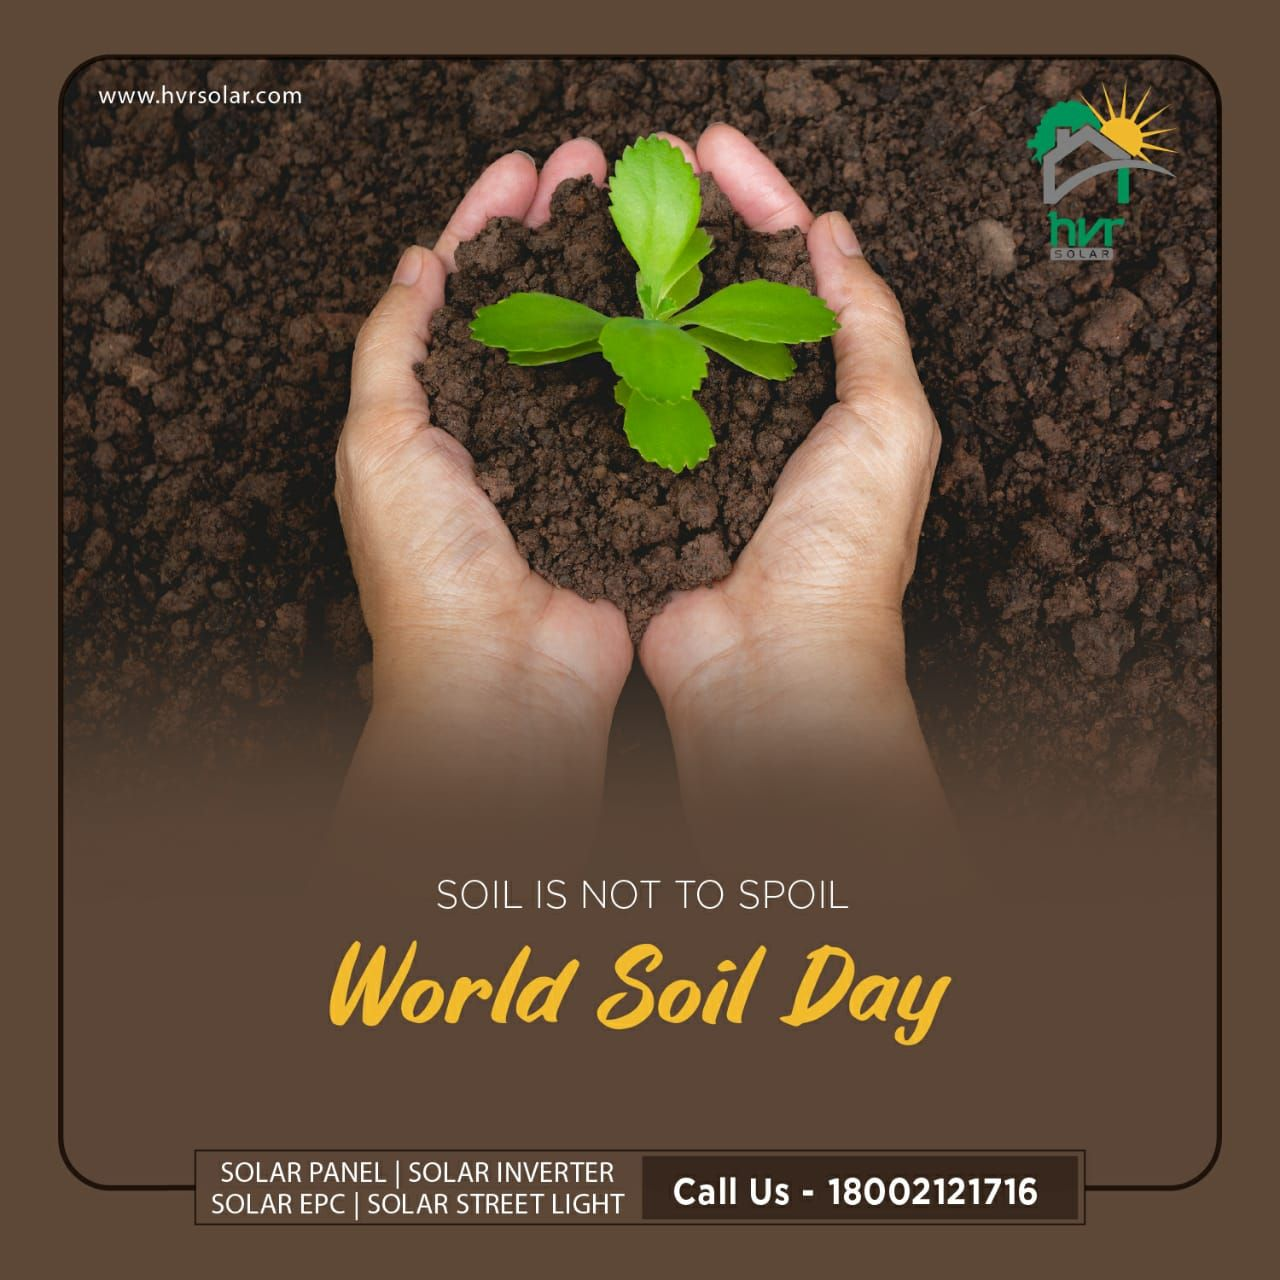 #Soil gives us food, soil gives us life!  Prevent #soilpollution if you want a healthy #future. . . . #WorldSoilDay #SoilDay2019 #LiveGreen #SoilisLife #StopSoilErosion #LivingSoil #SoilForLife #SaveEnvironment #SolarPower #GreenEnergy #SolarEnergy #SunEnergy #GoGreen #SwitchToSolarPanel #SolarEnergyPanels #SolarEnergyForLife #SolarEnergyWorld #SolarPanels